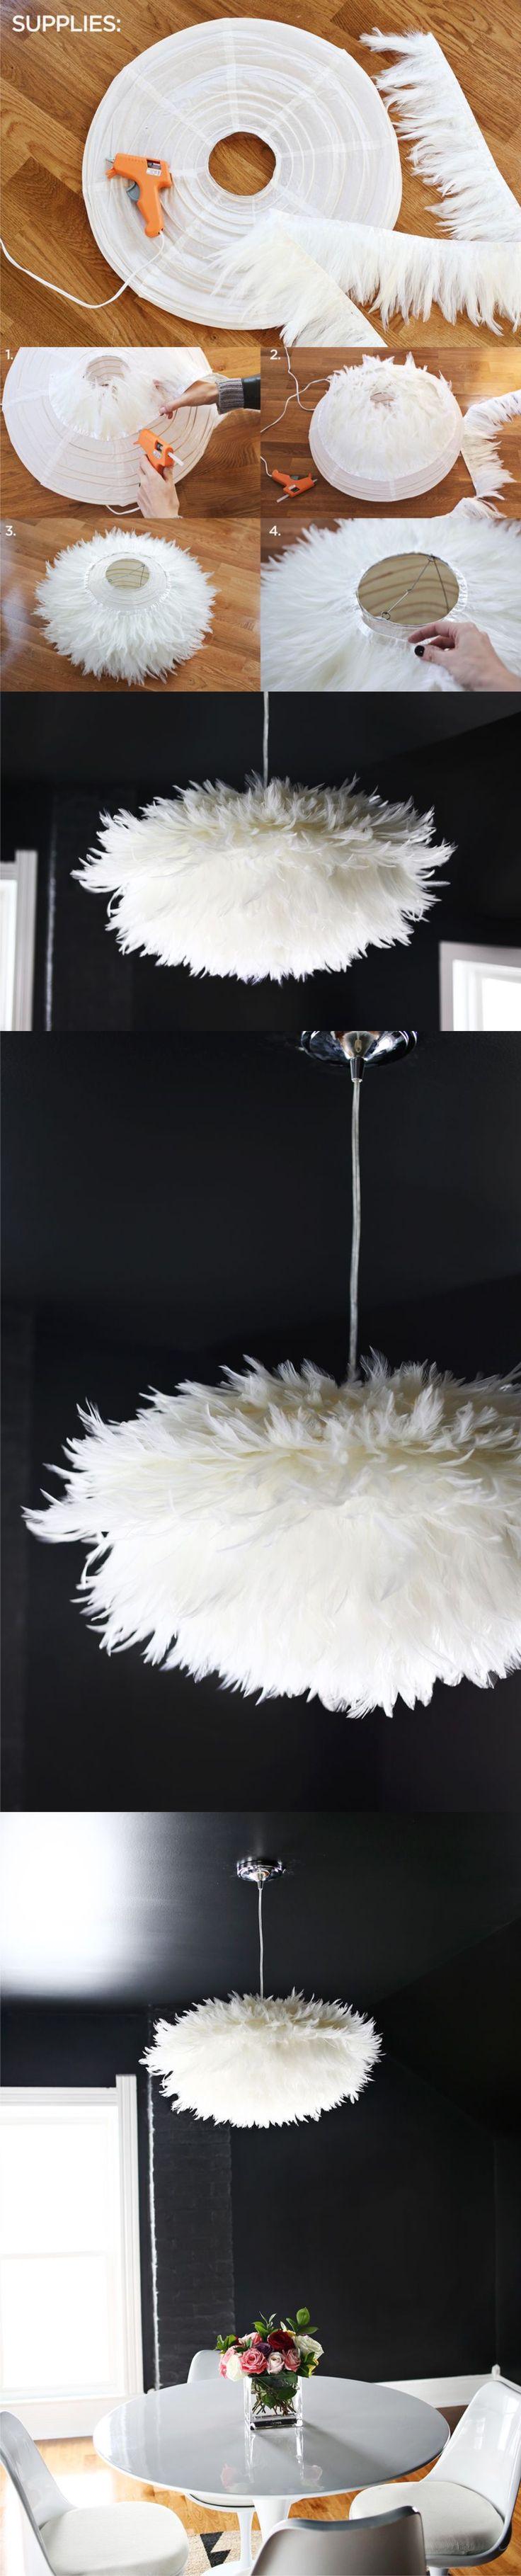 19 DIY Chic White Feather Chandelier